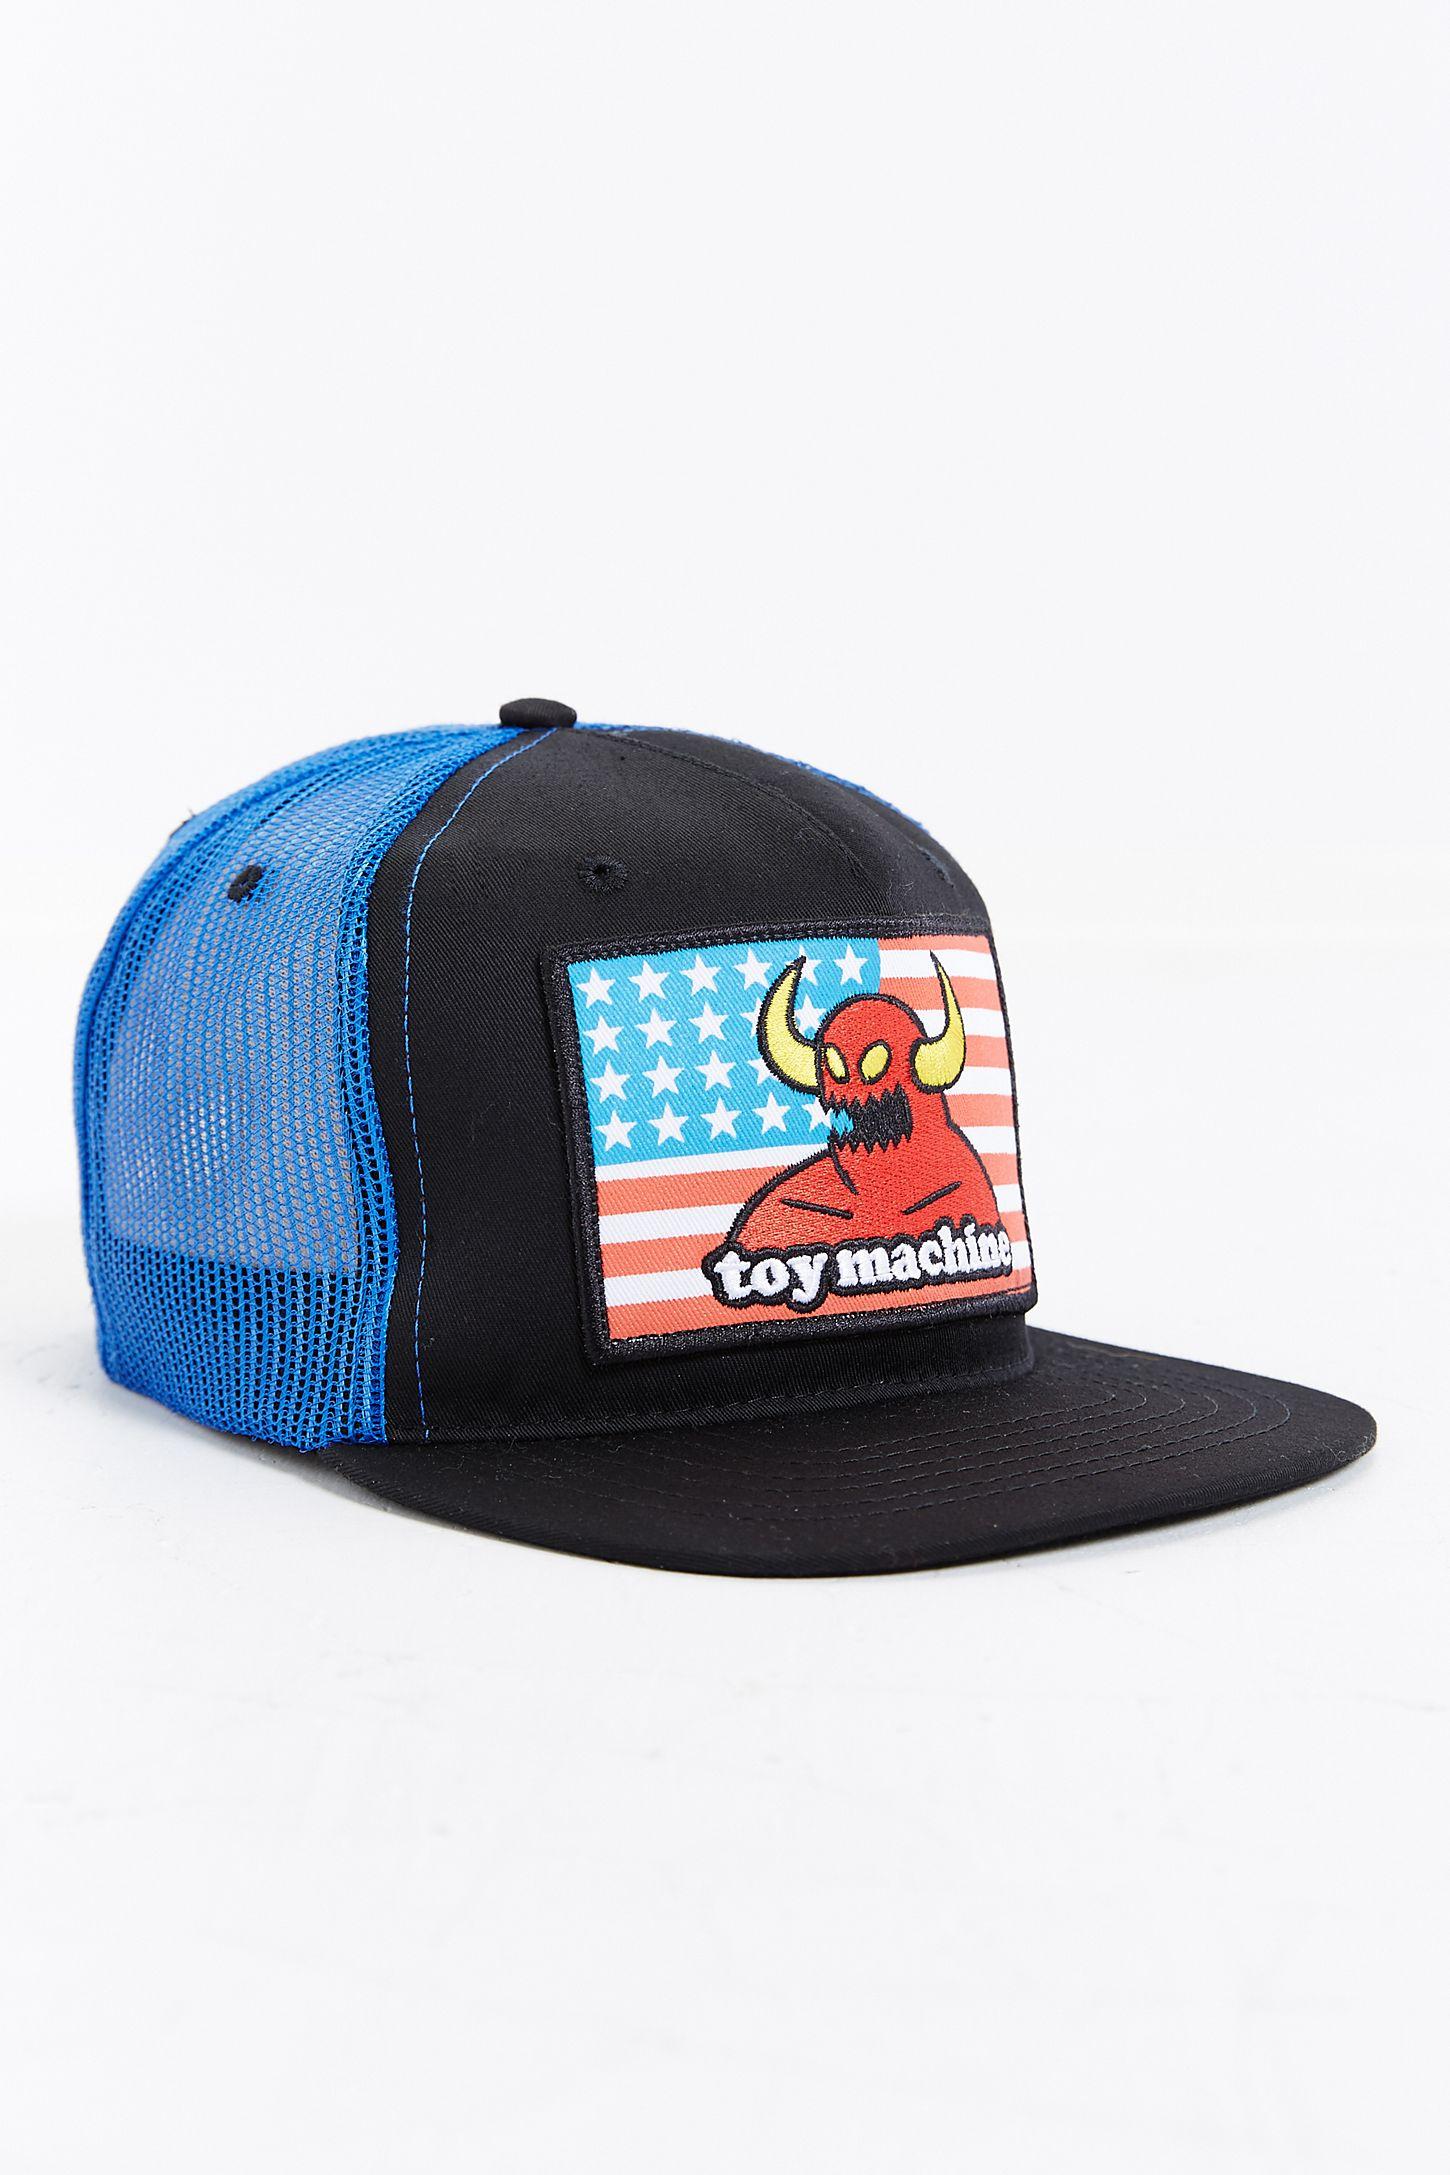 Toy Machine American Monster Trucker Hat  68de2bcdd6f